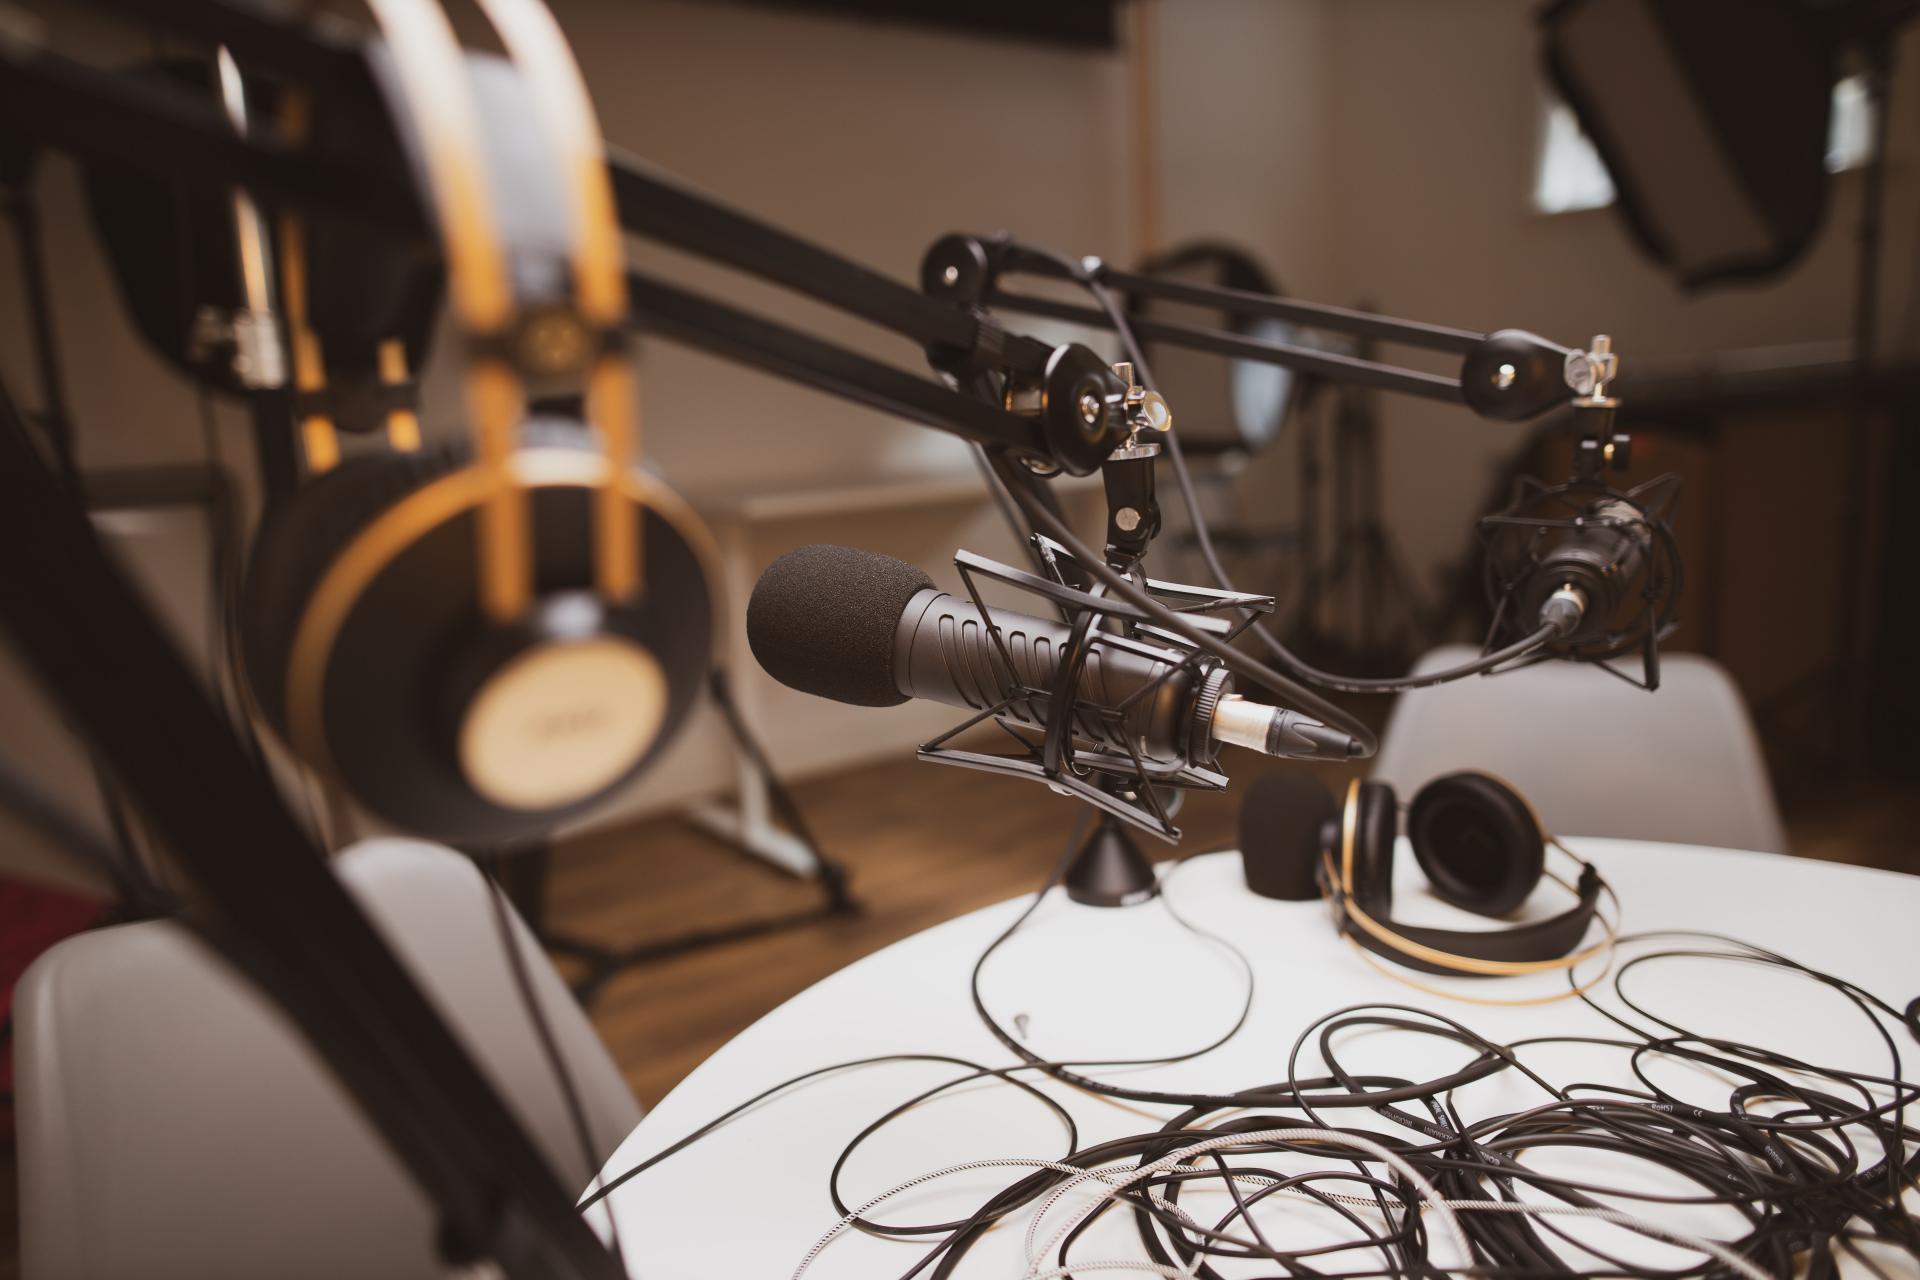 Podcast equipment in a sound studio